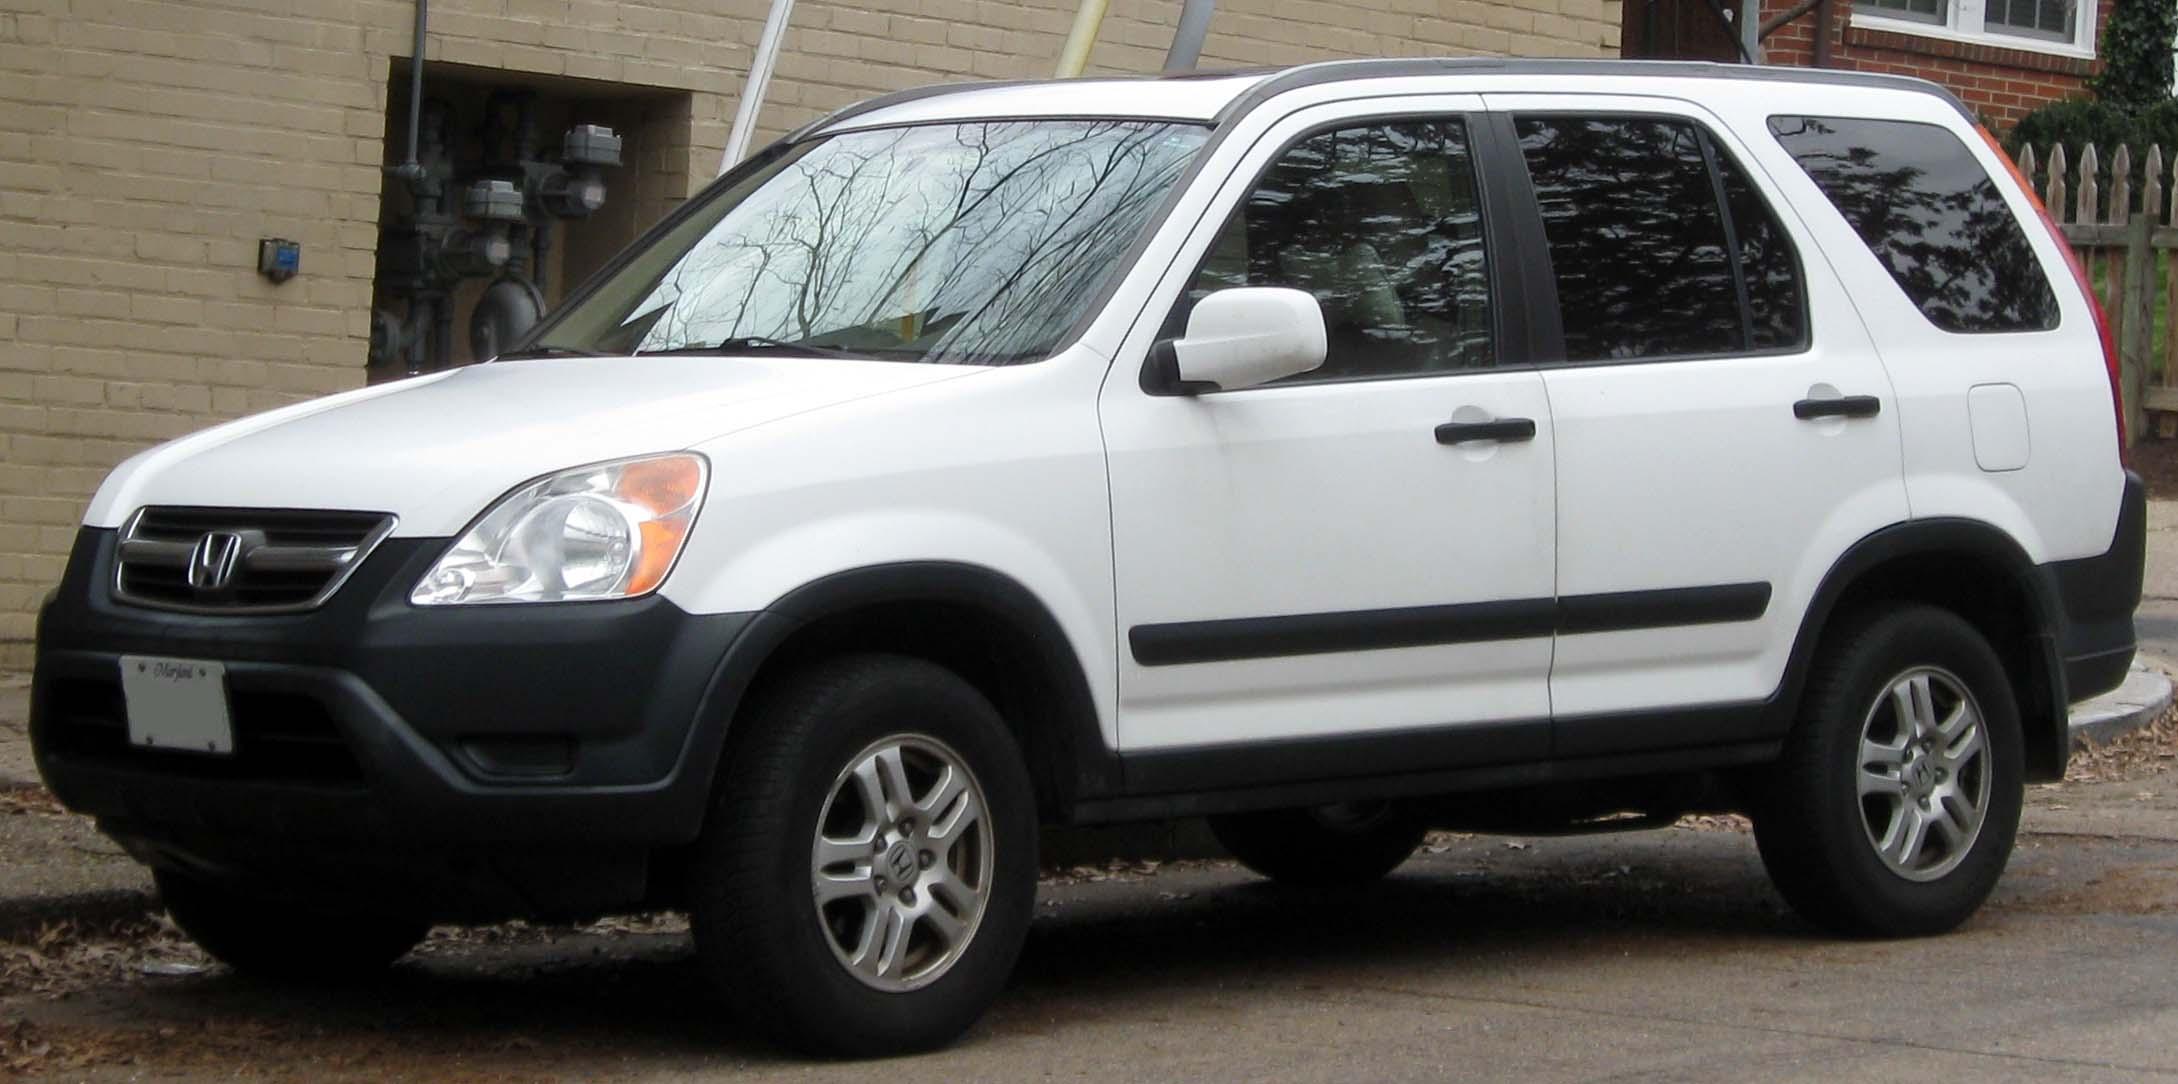 2005 Honda Accord Lx >> 2002 Honda CR-V LX 2WD VIN Number Search - AutoDetective